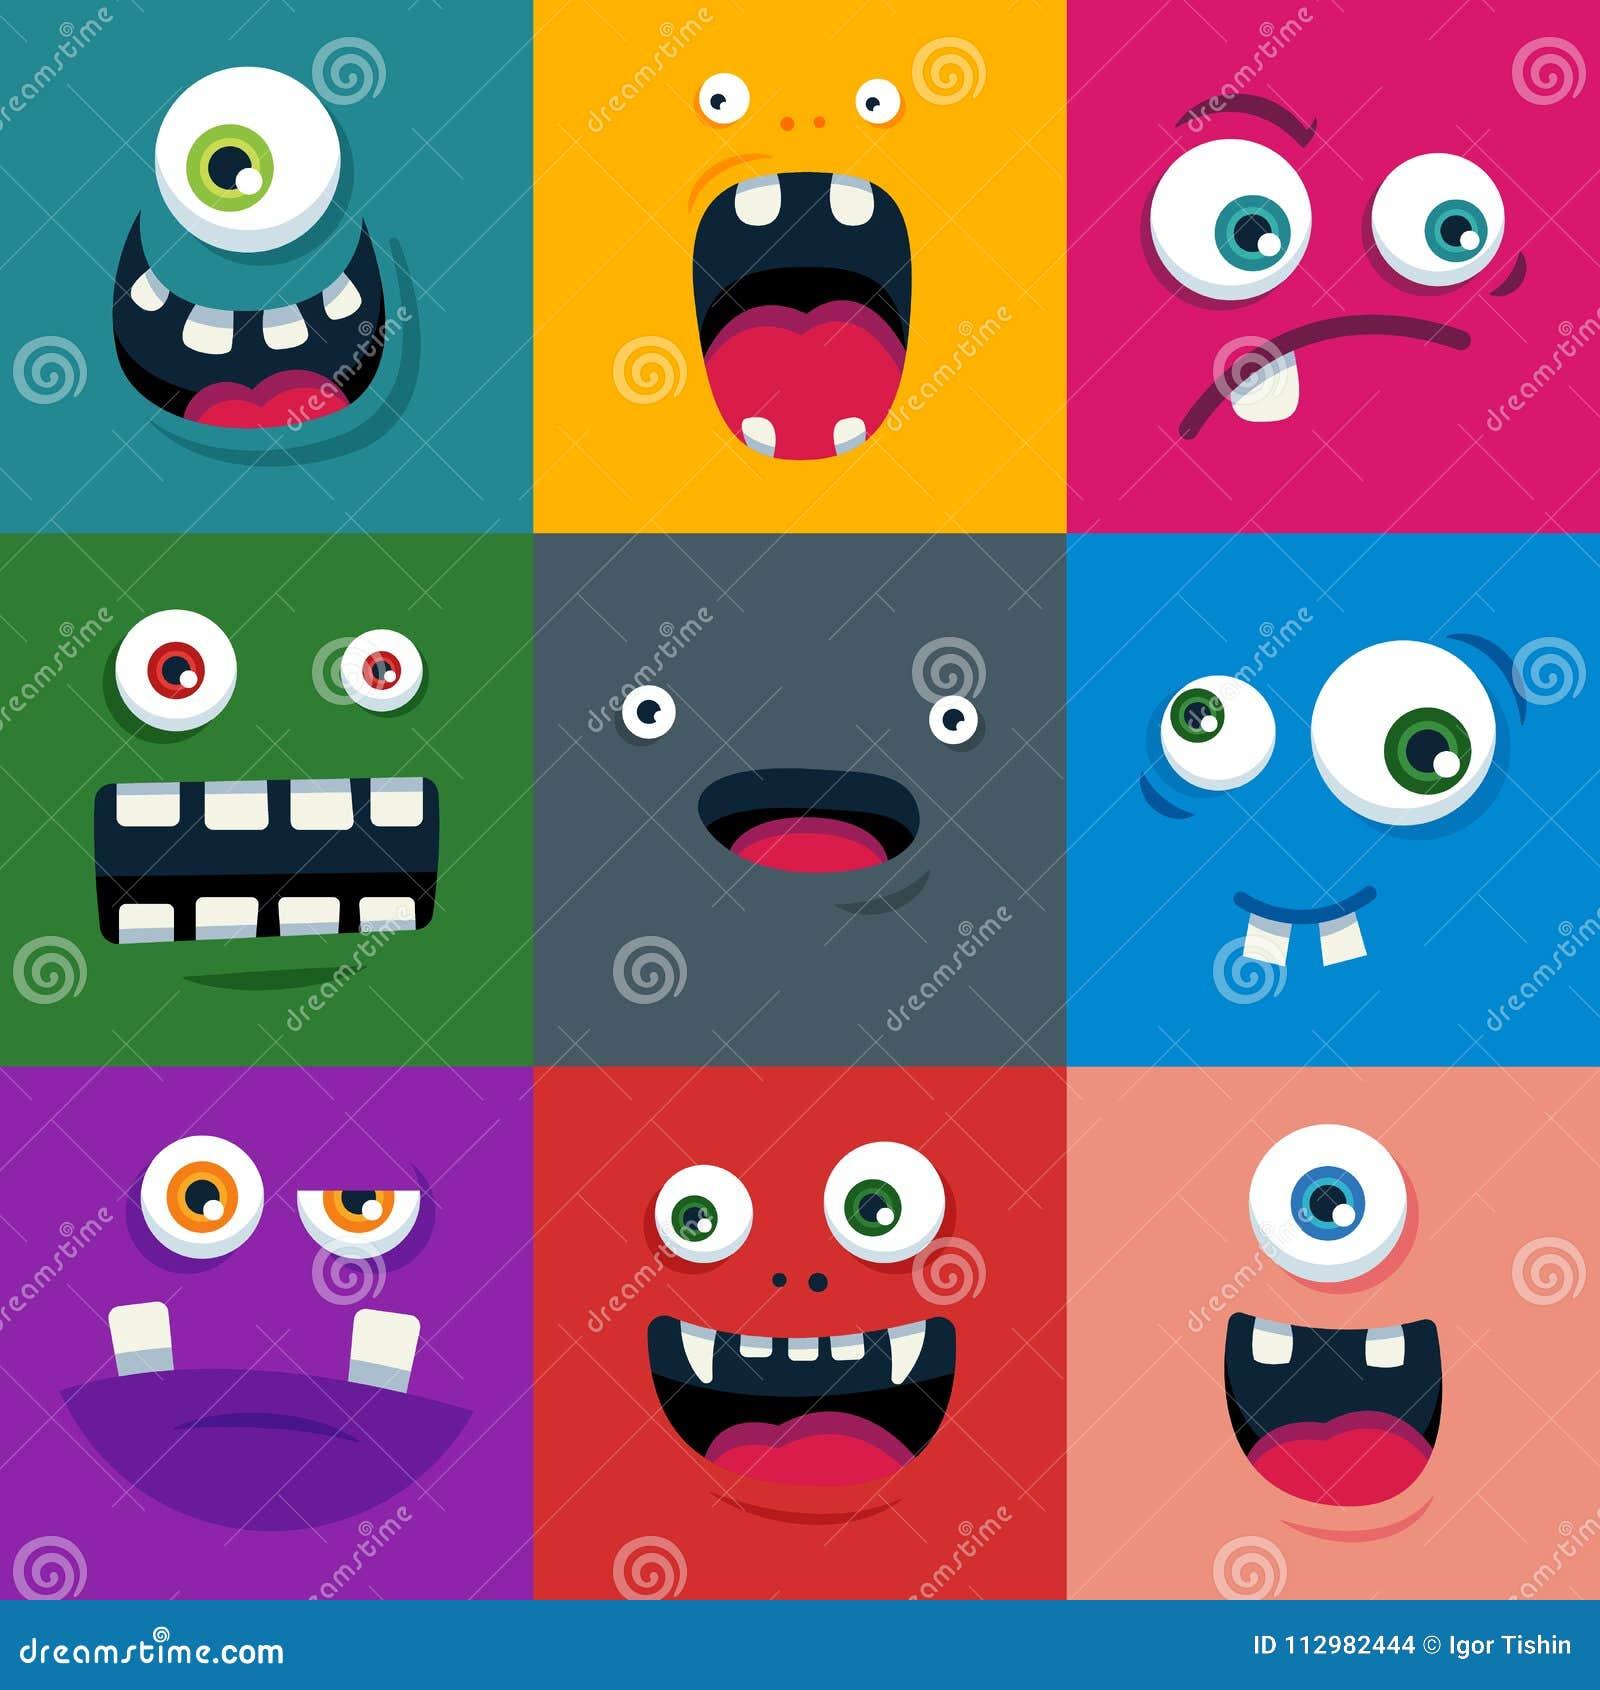 Set of cartoon cute monster faces. flat vector illustration